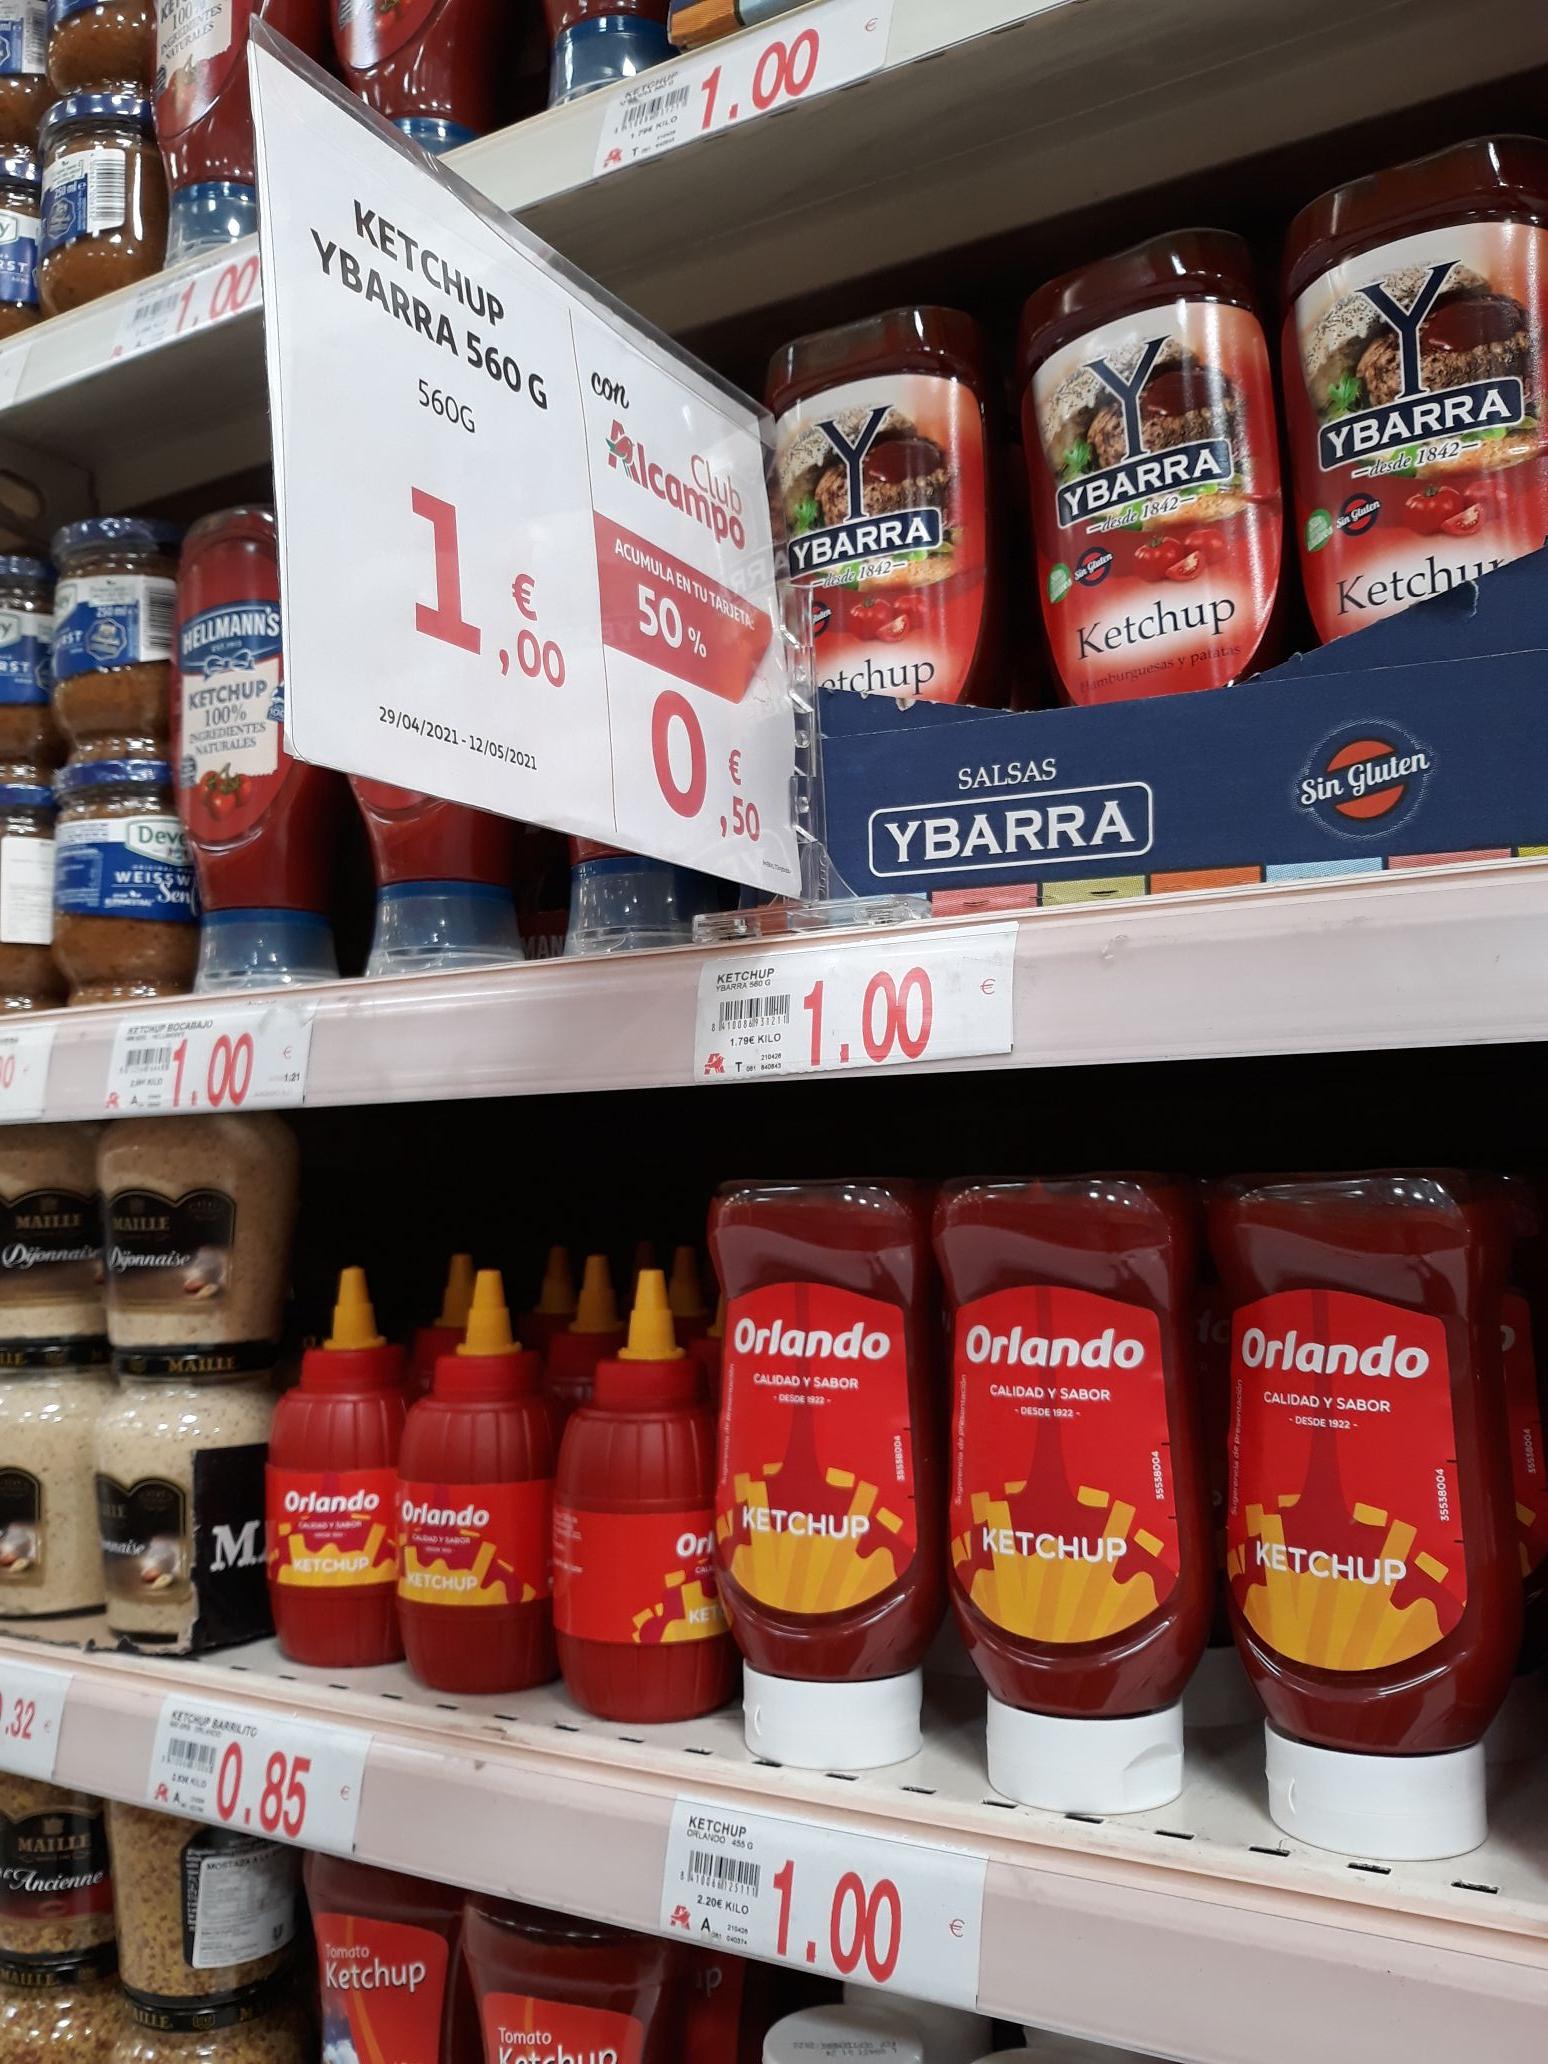 Ketchup Ybarra 560 gr en Alcampo Bonaire